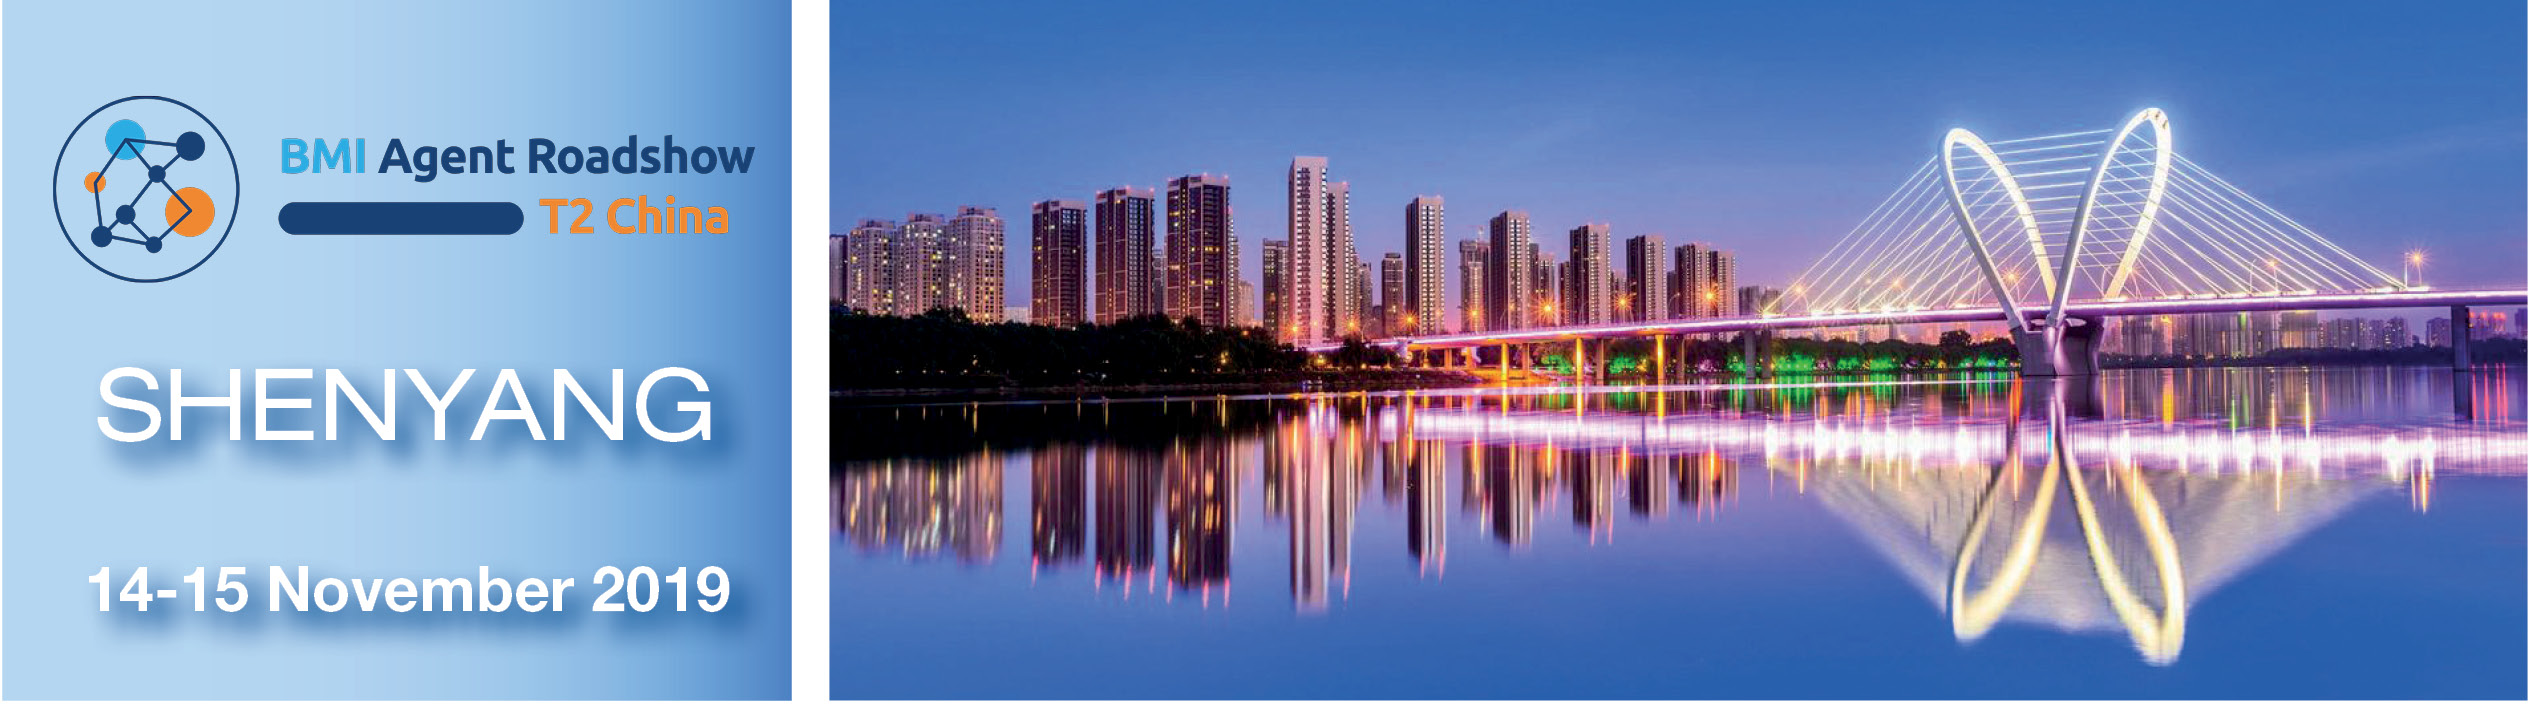 2019 BMI Agent Roadshow in Shenyang